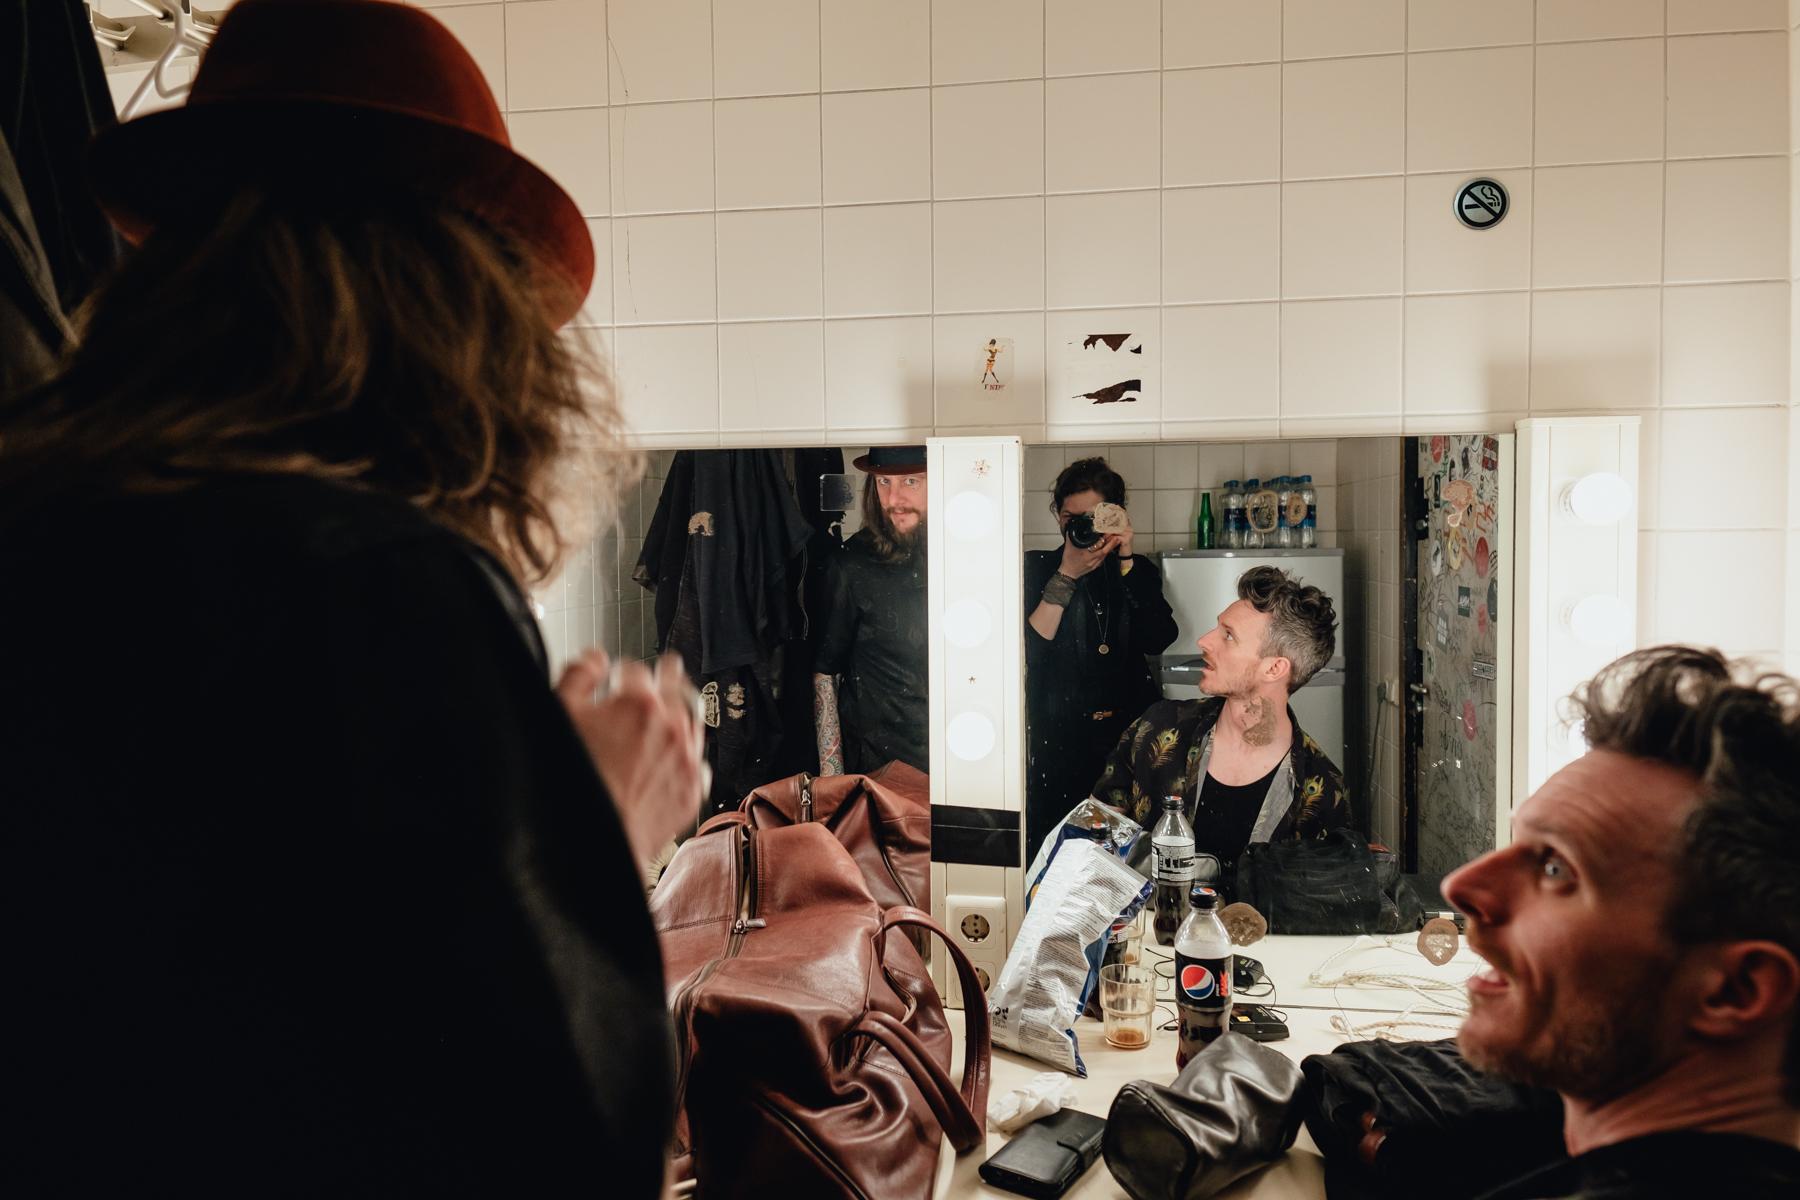 0911_04142019_the Slow Show_Bitterzoet_Tess Janssen.jpg